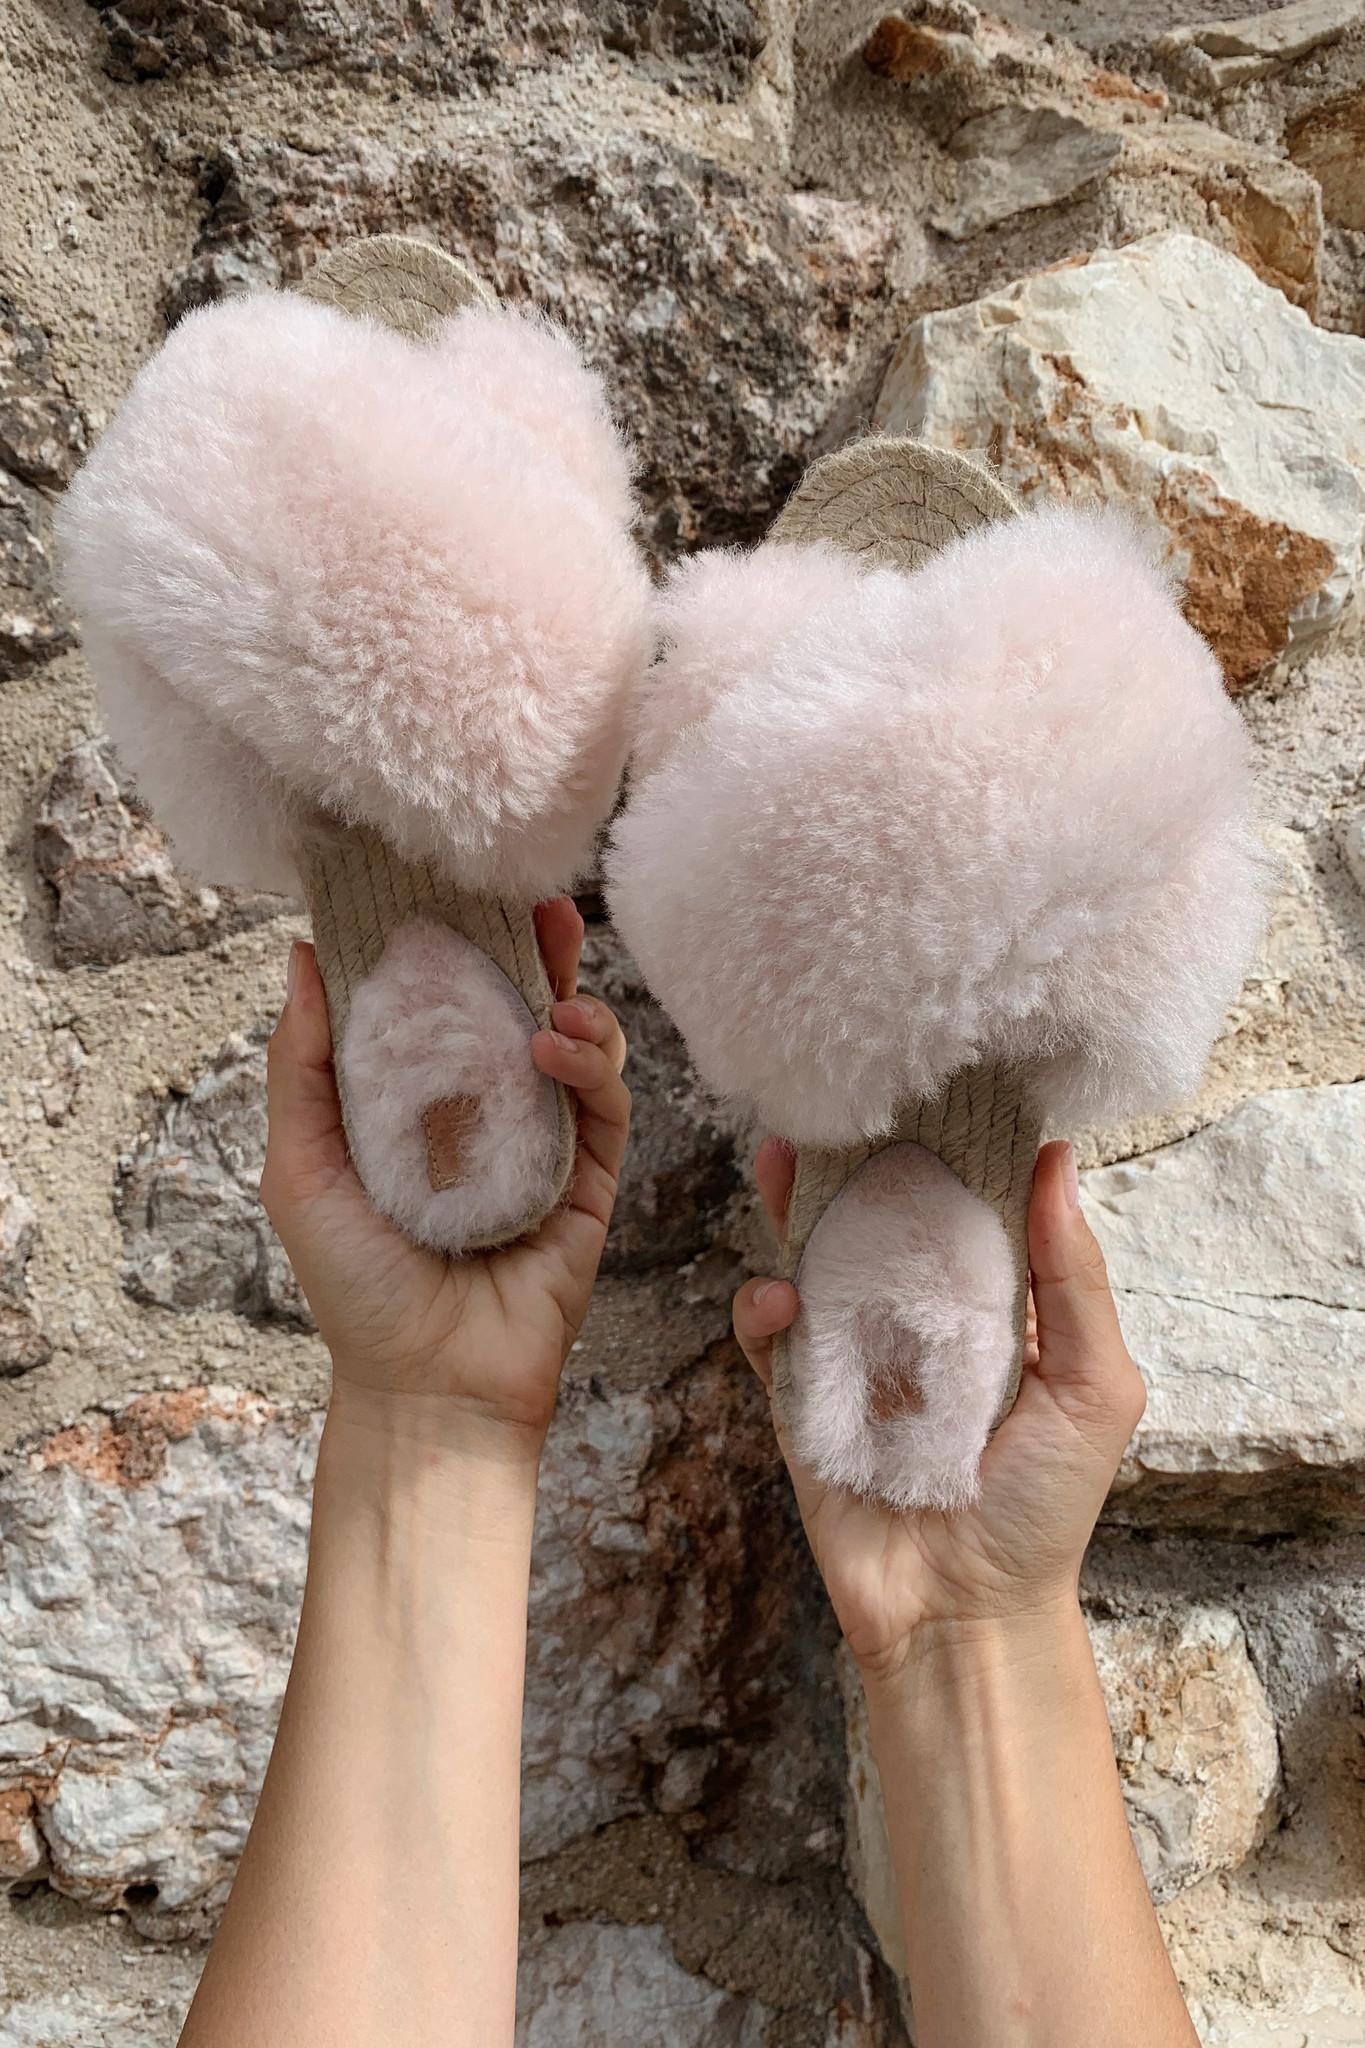 Lori Sheepskin Wool Slippers - Off White-9